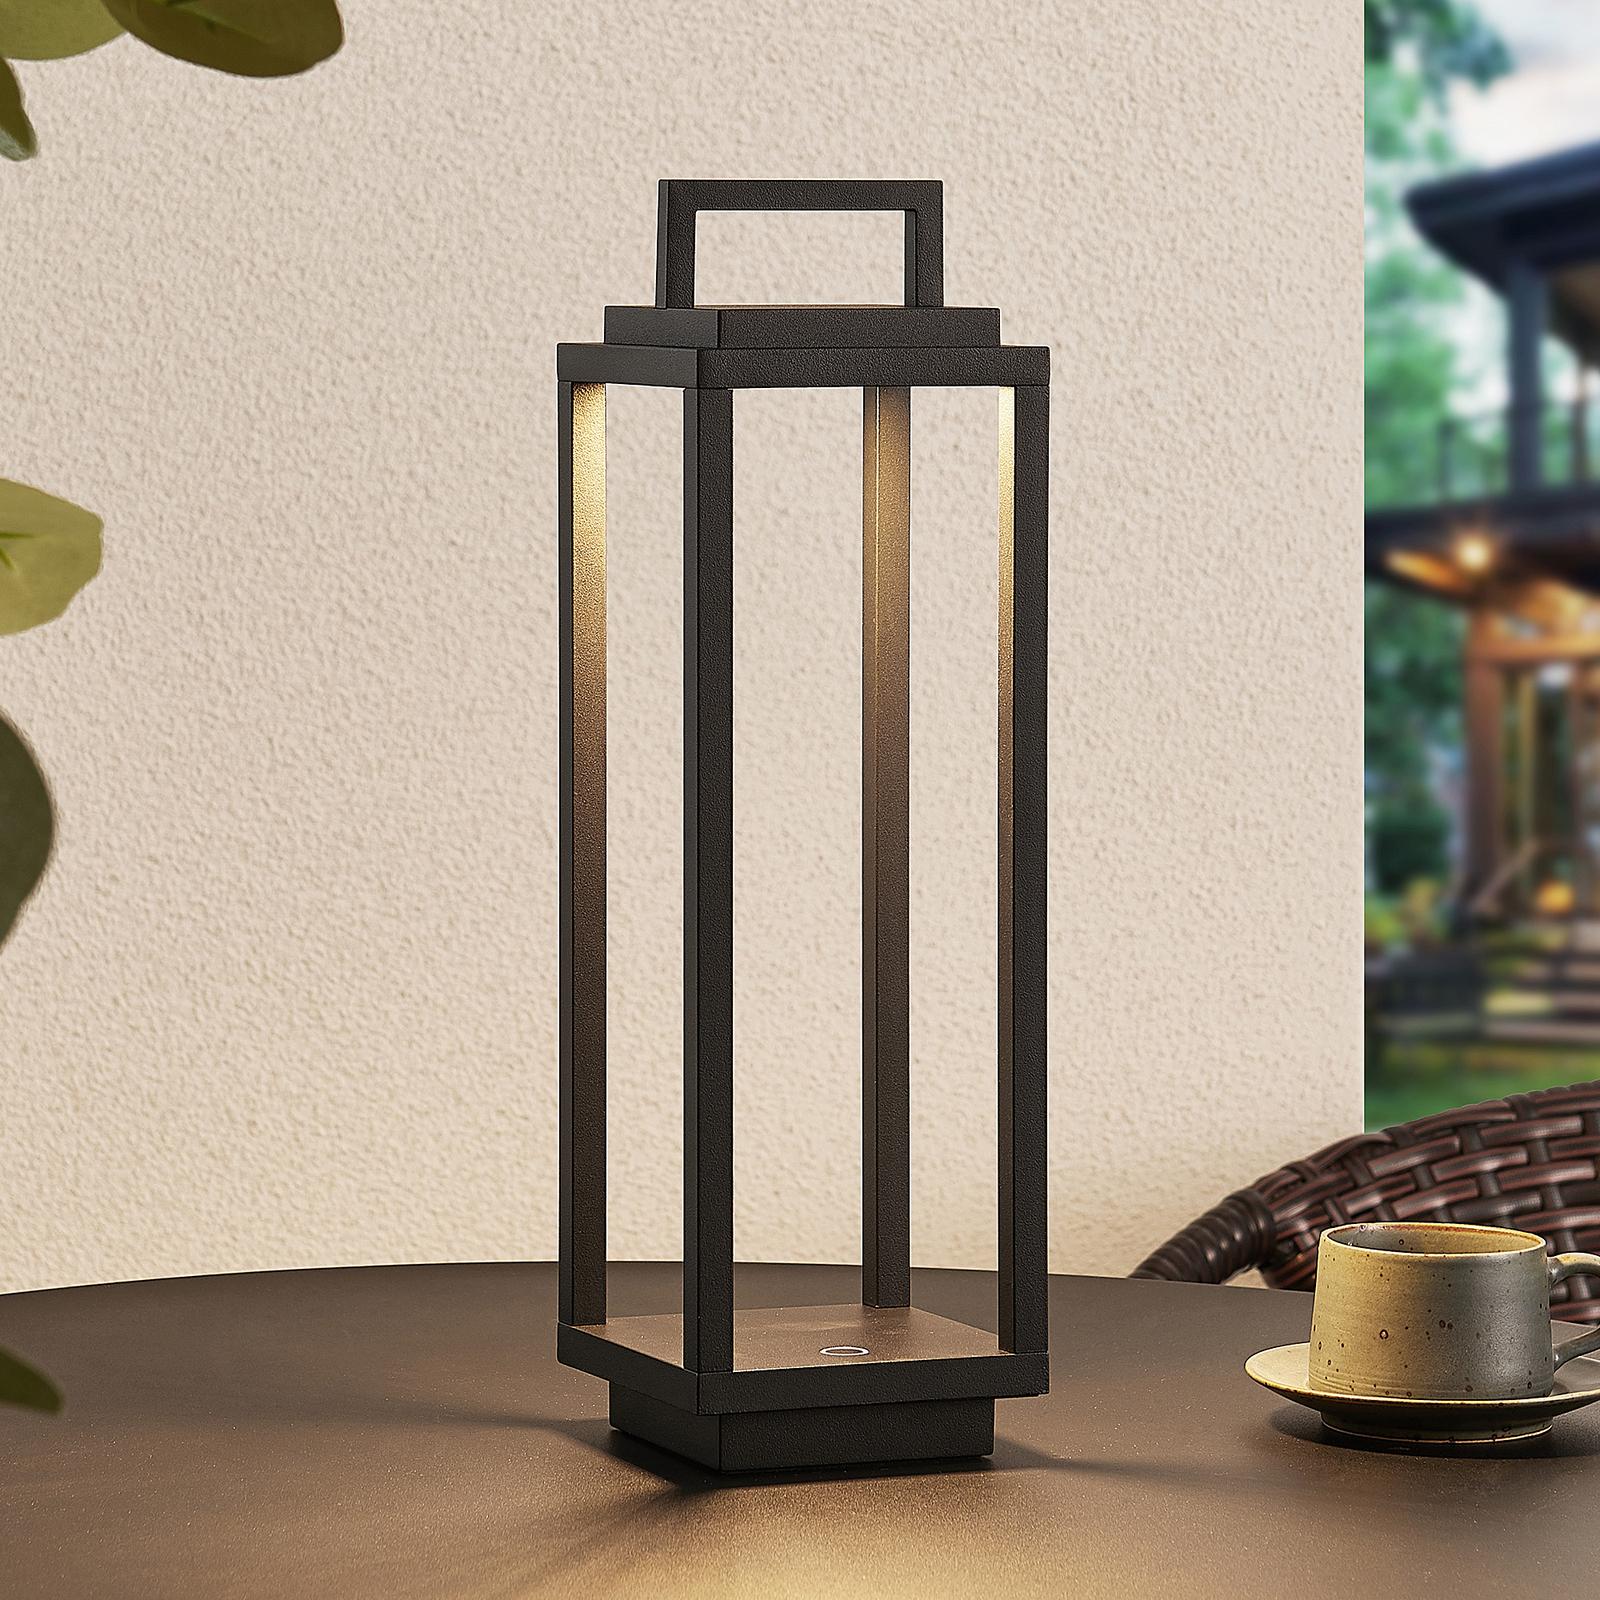 Lucande Mirina LED-Außenlaterne, USB, schwarz